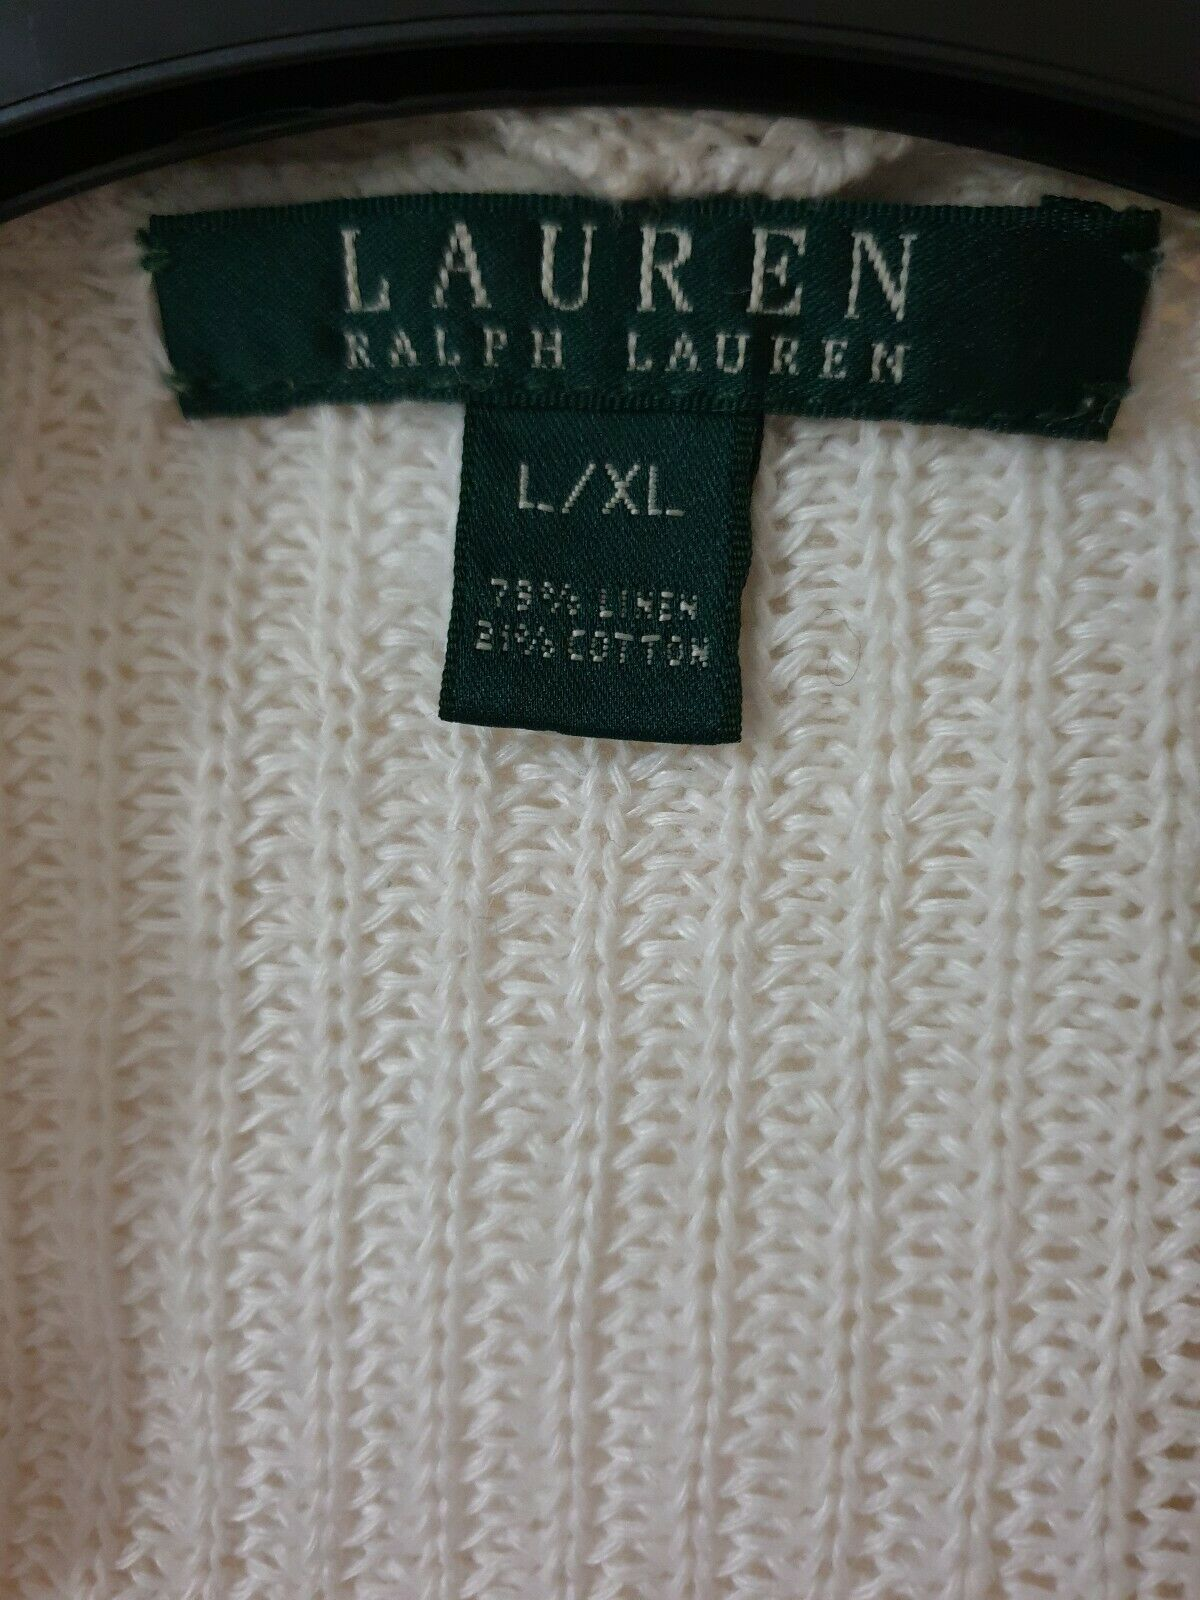 Lauren By Ralph Lauren White White White Womens L XL 3 4 sleeved Cardigan , in excellent con 28db07